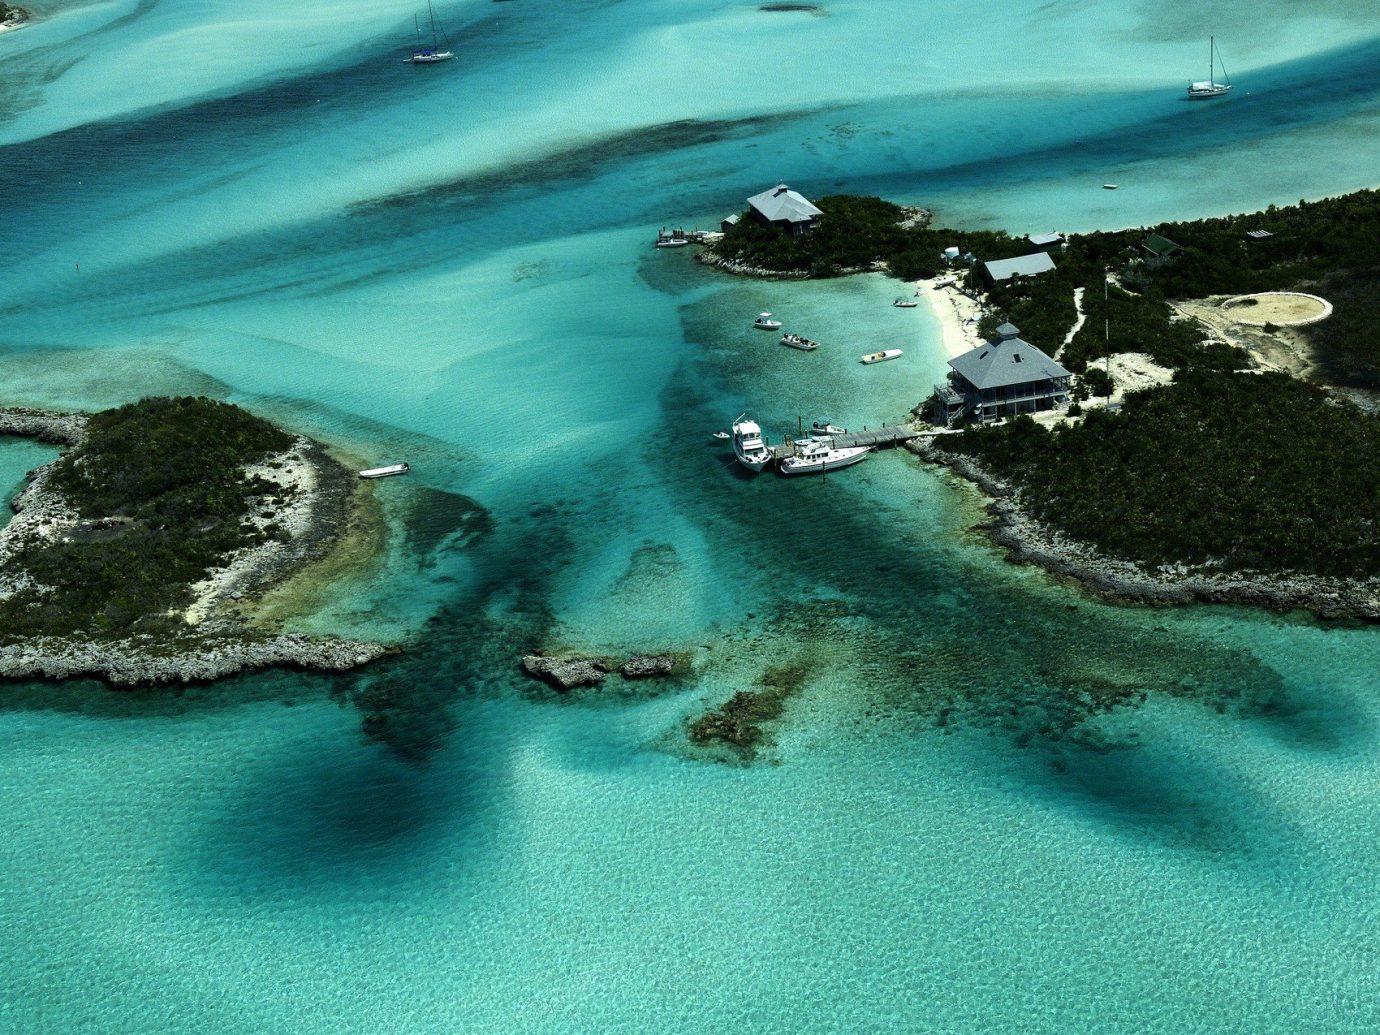 Aerial shot of Nassau, Bahamas